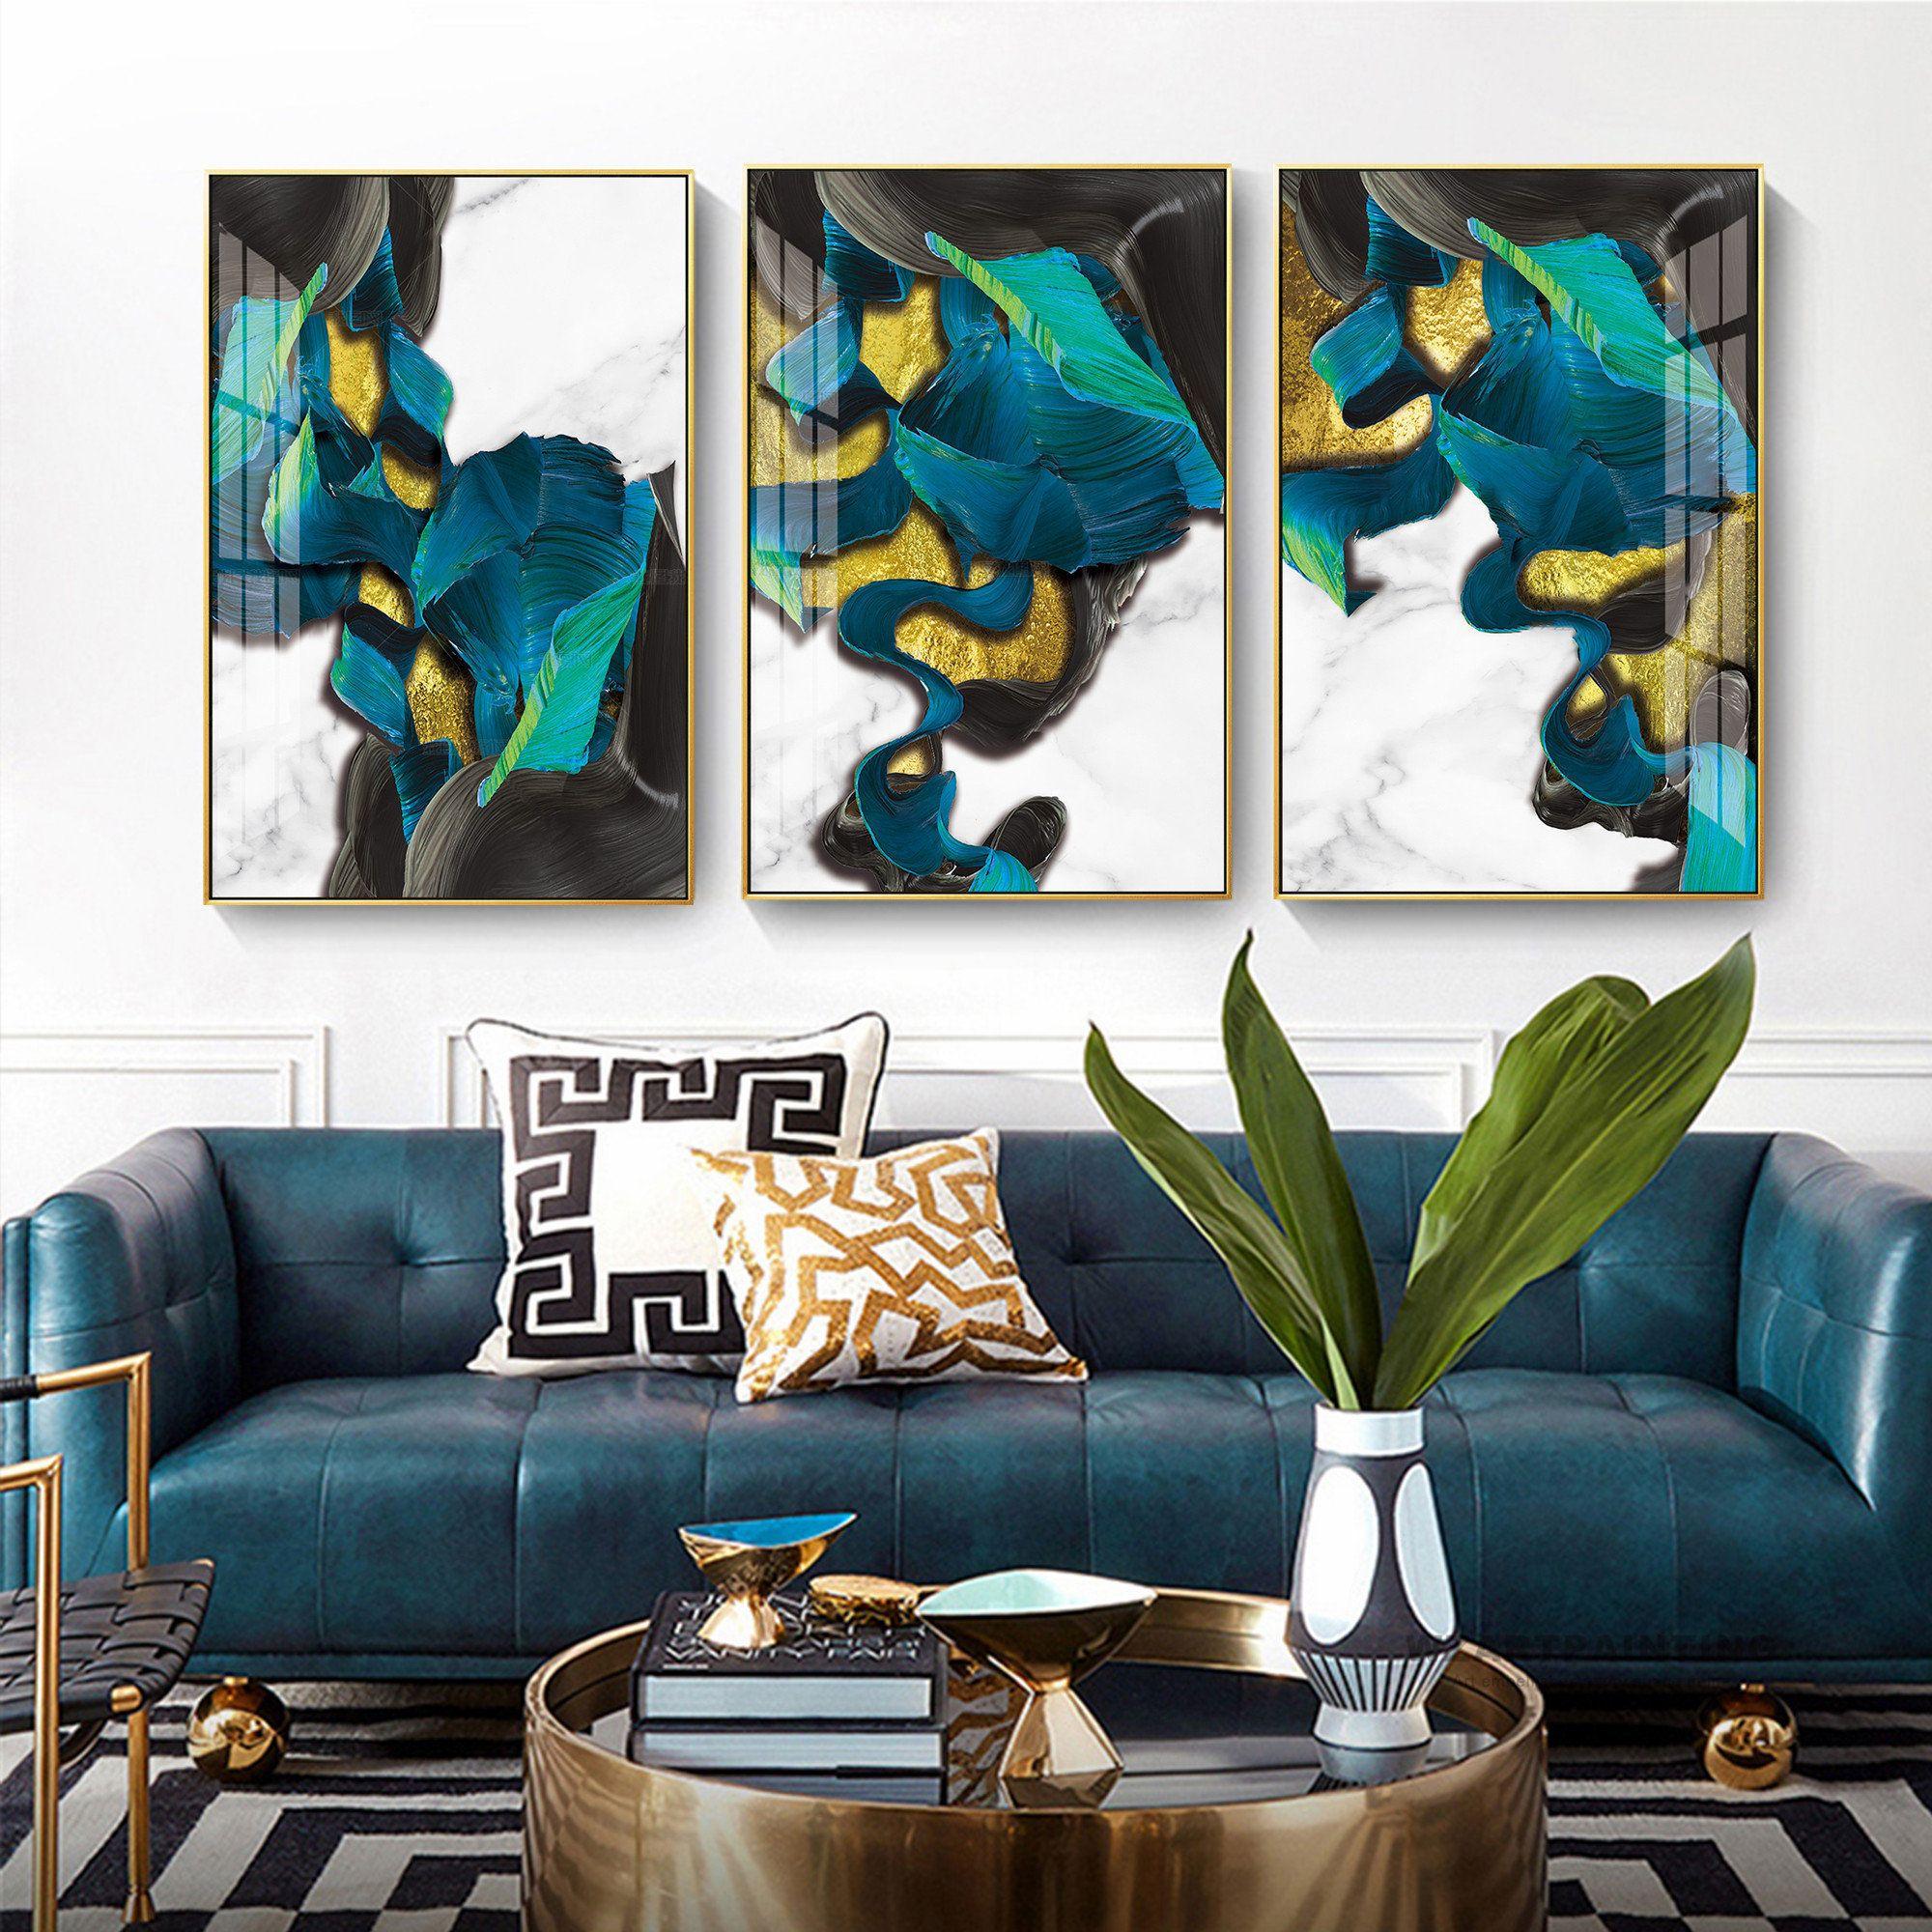 Framed Wall Art Set Of 3 Prints Abstract Gold Navy Blue Black Etsy Framed Wall Art Sets Frames On Wall Framed Wall Art